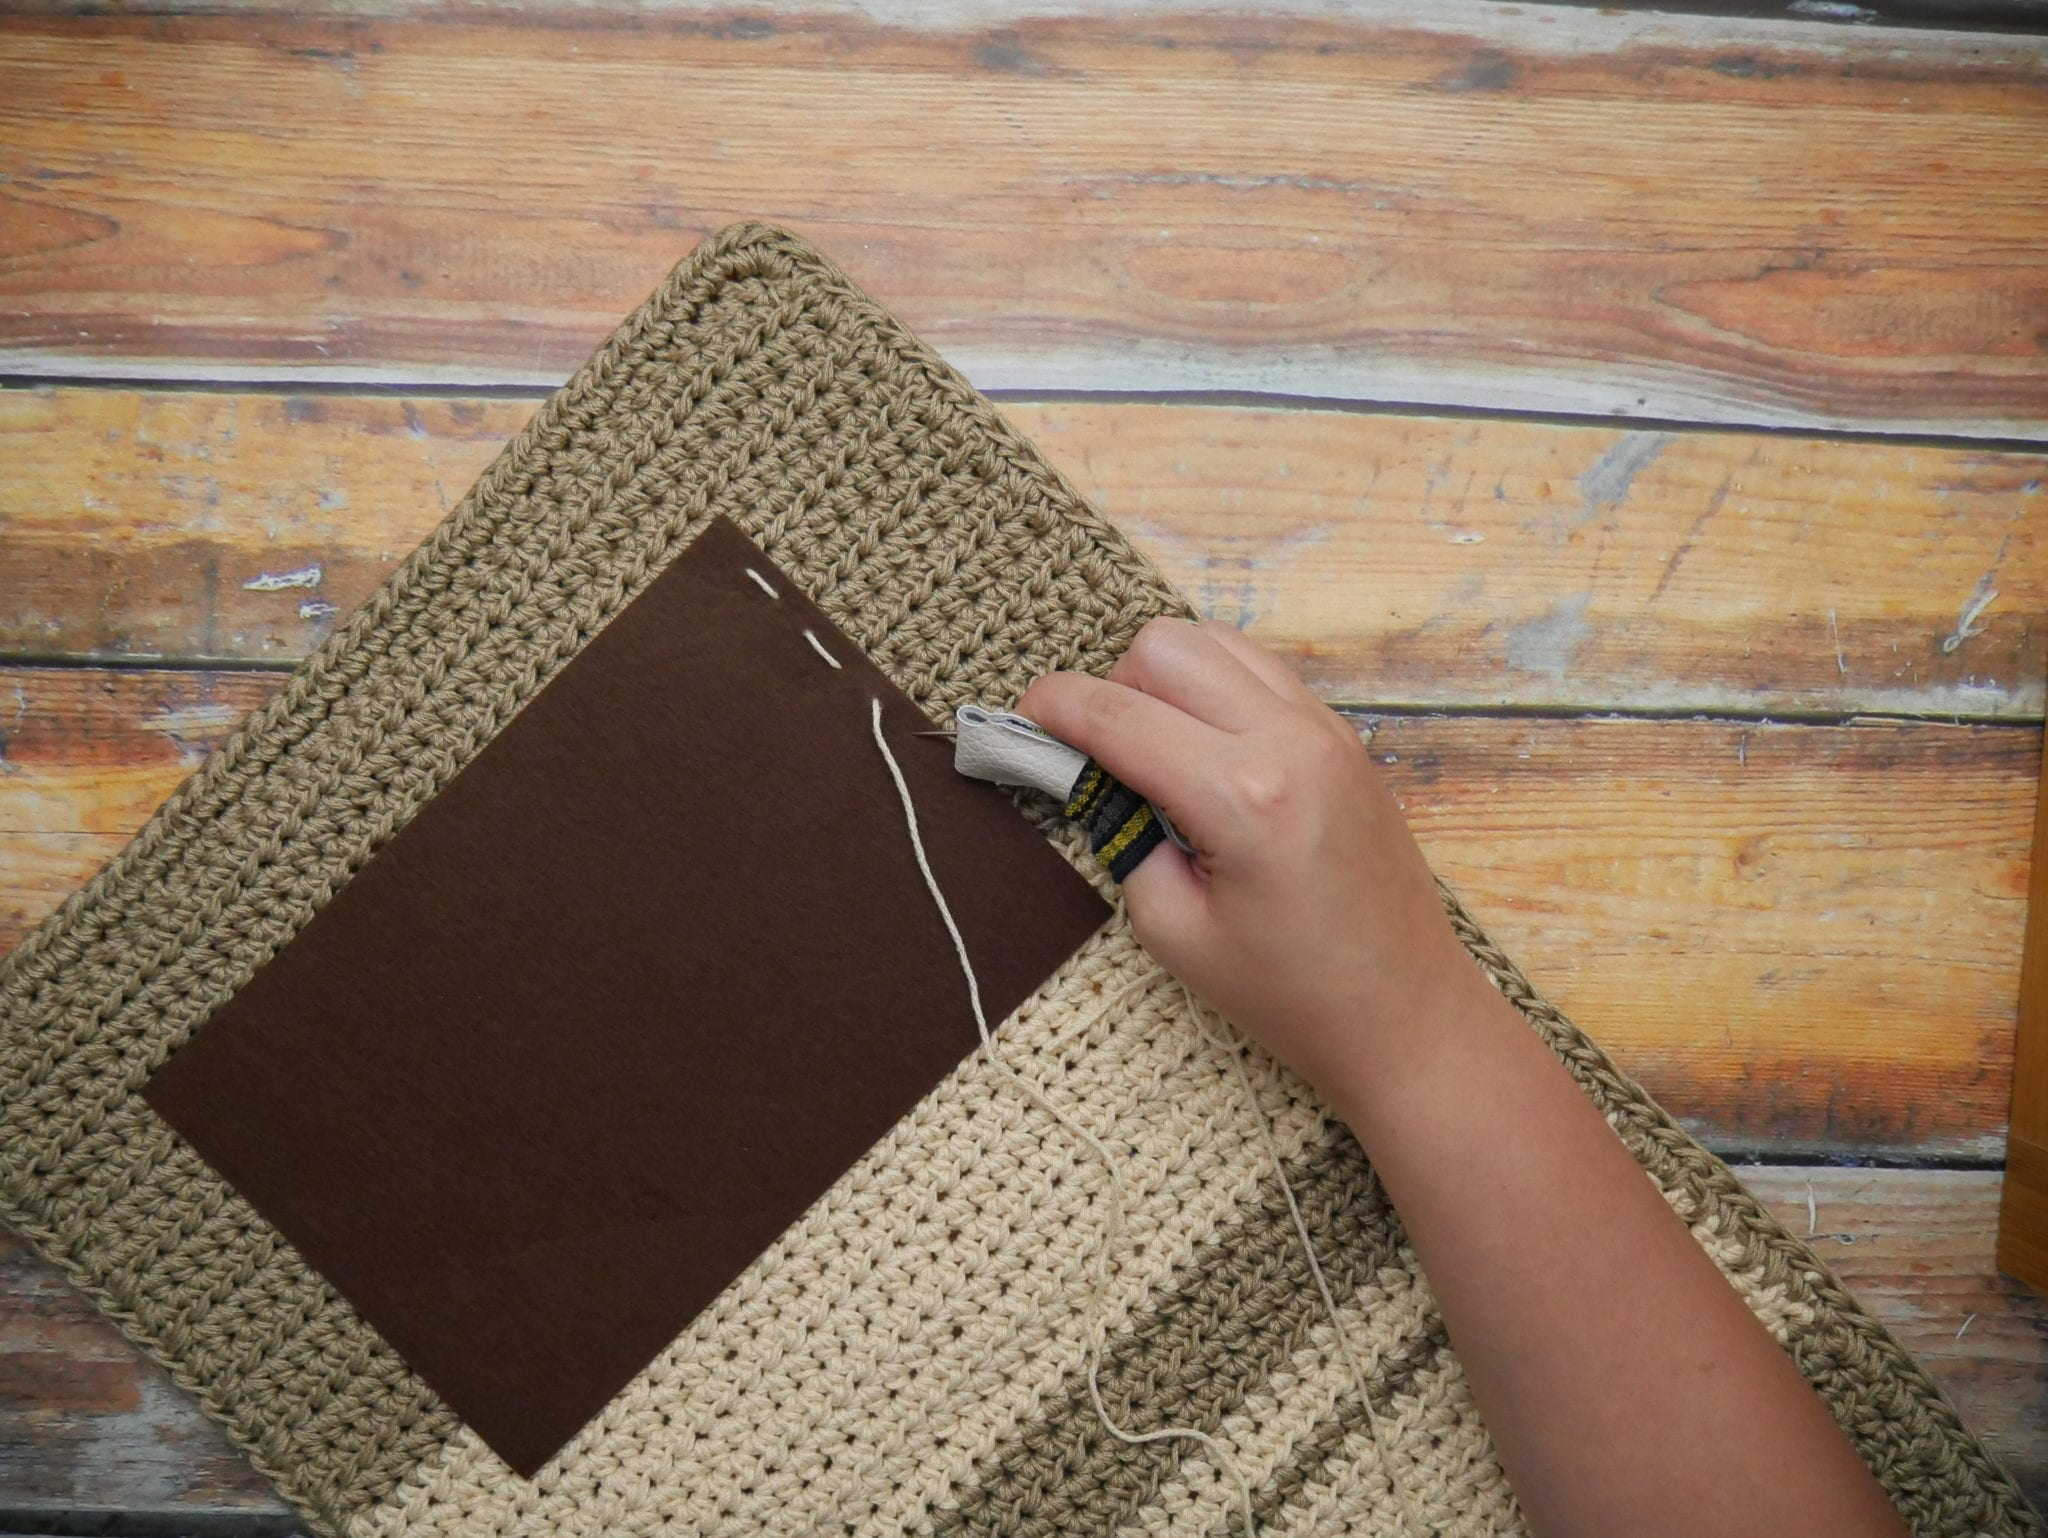 Crochet Desk Mat Amp Ottlite Review Amp Giveaway Sewrella